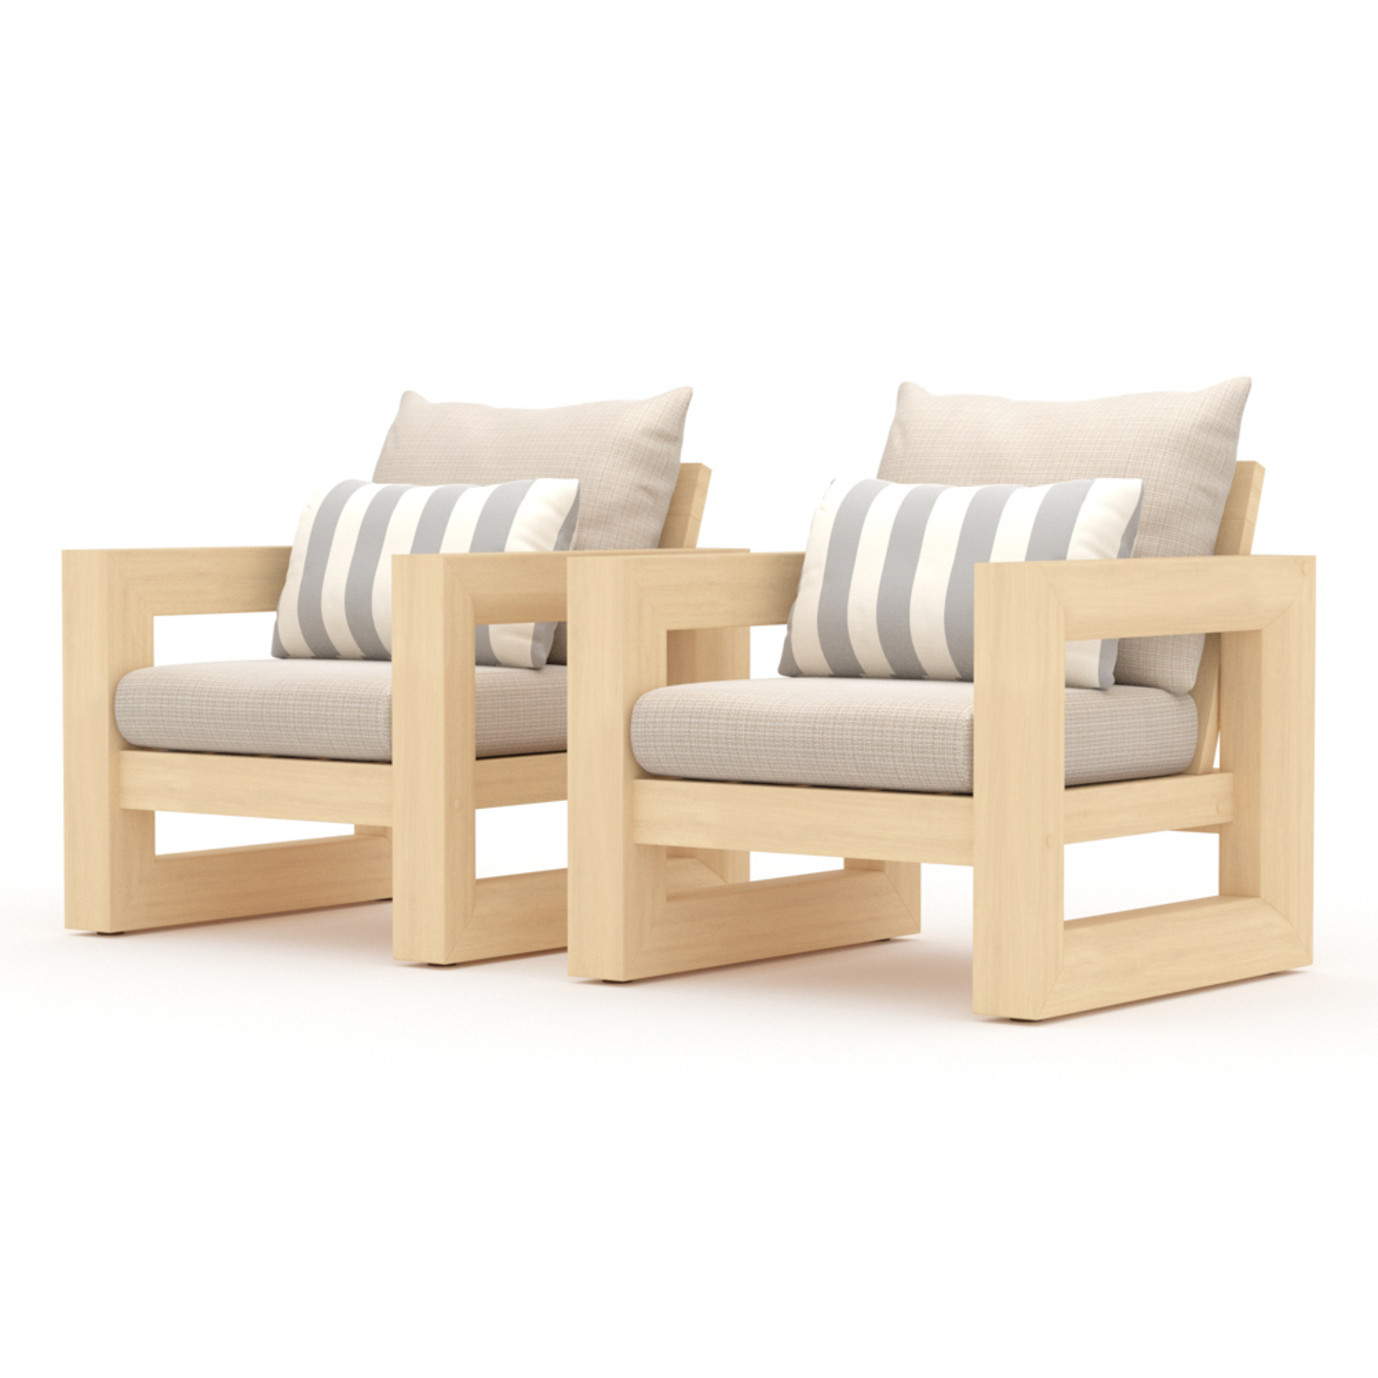 Benson Club Chairs - Slate Gray